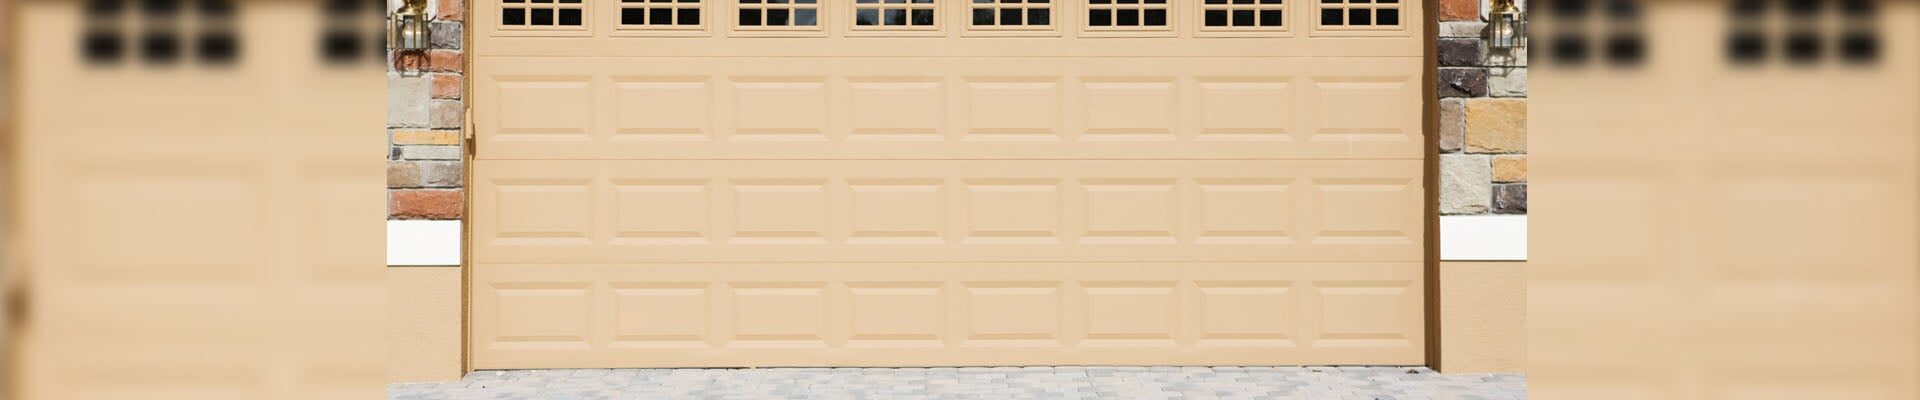 Home   Novato, CA   Automatic Garage Door Of Marin Inc.